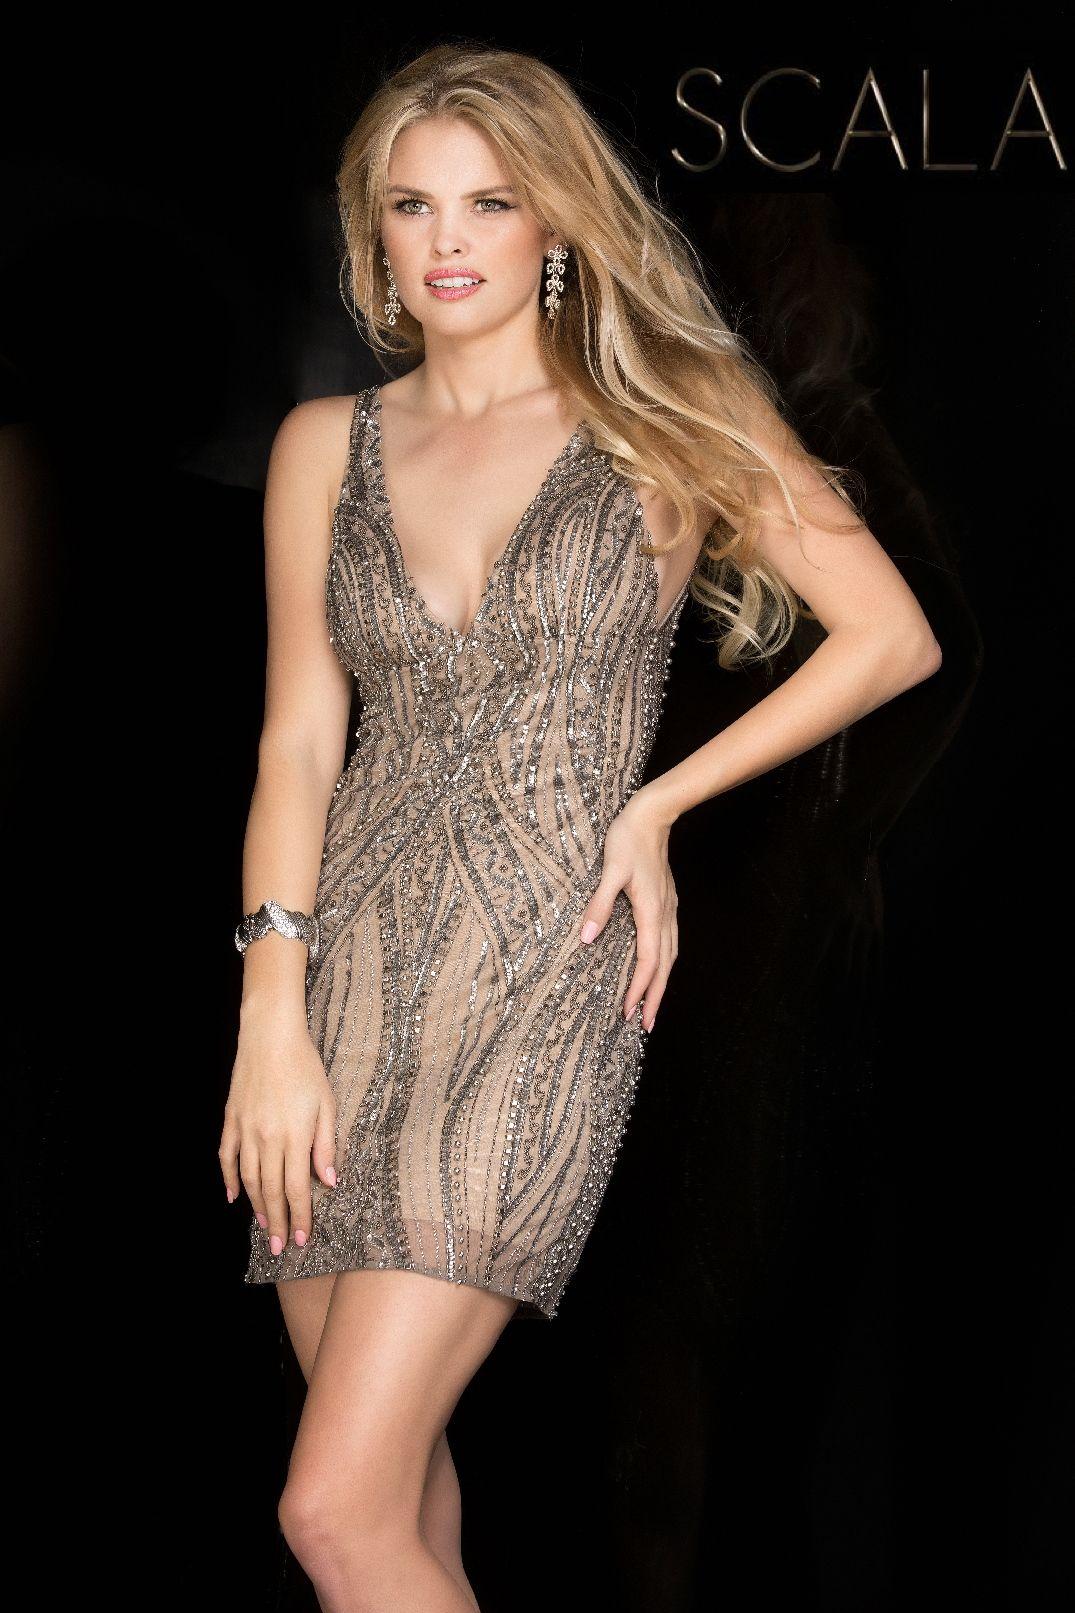 Evening dresses prom dresses by scalaucbrueascucbrueillusion sheer